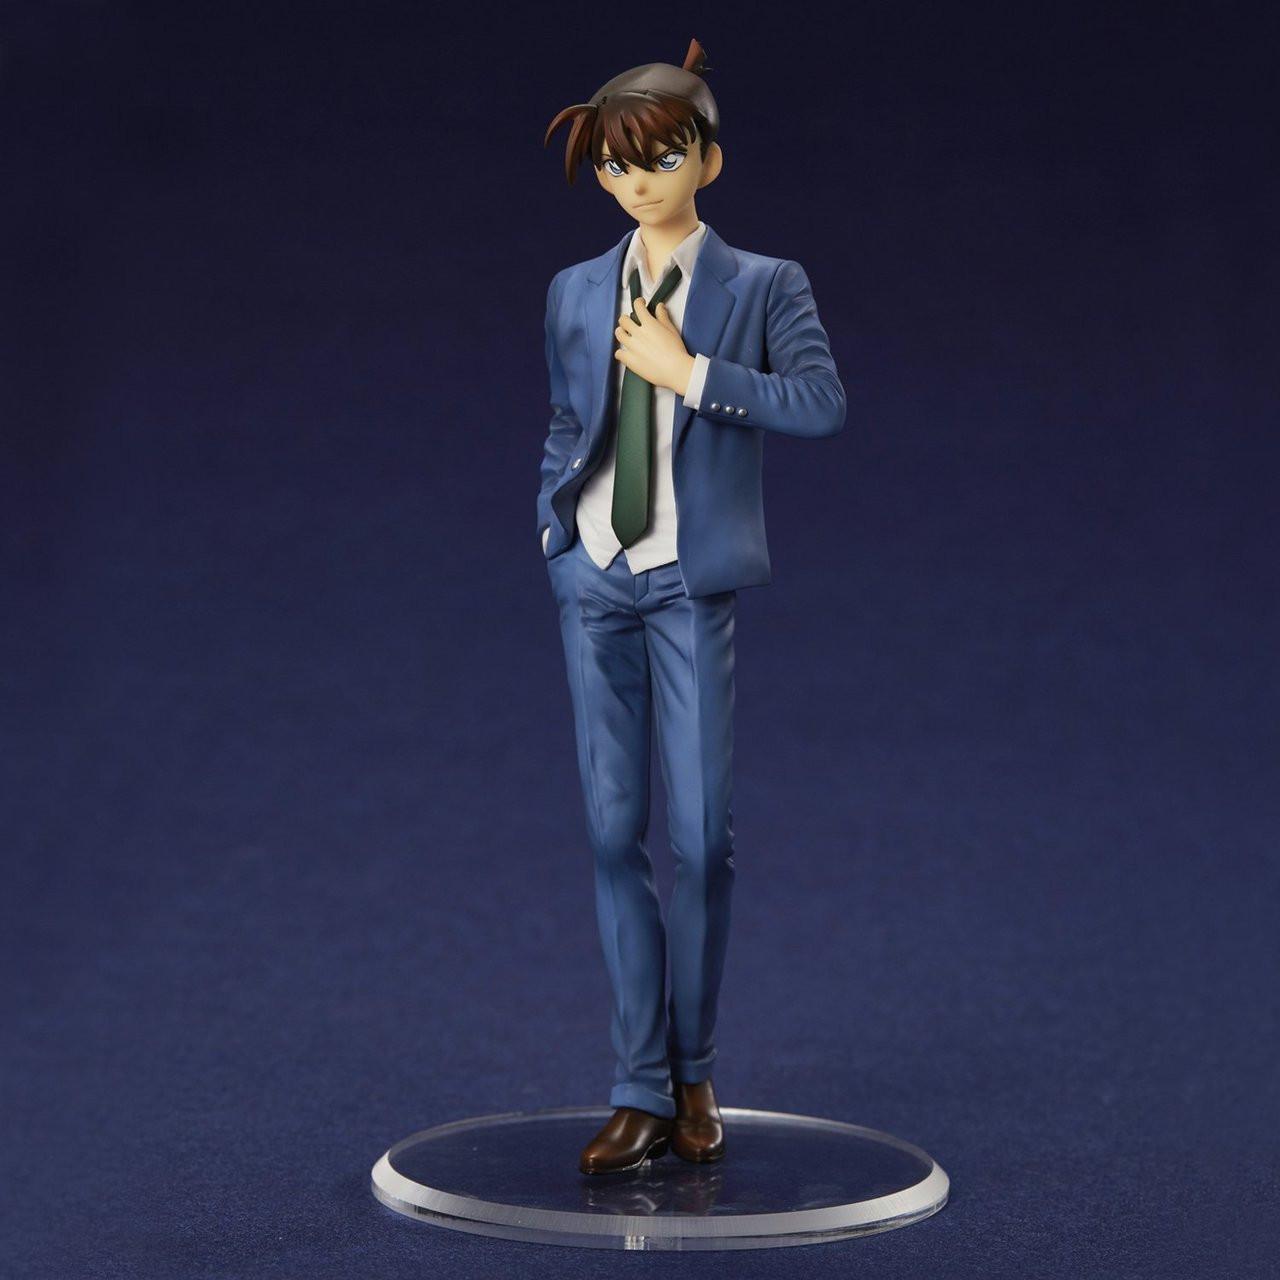 Detective Conan Edogawa Conan Figure Union Creative Japan